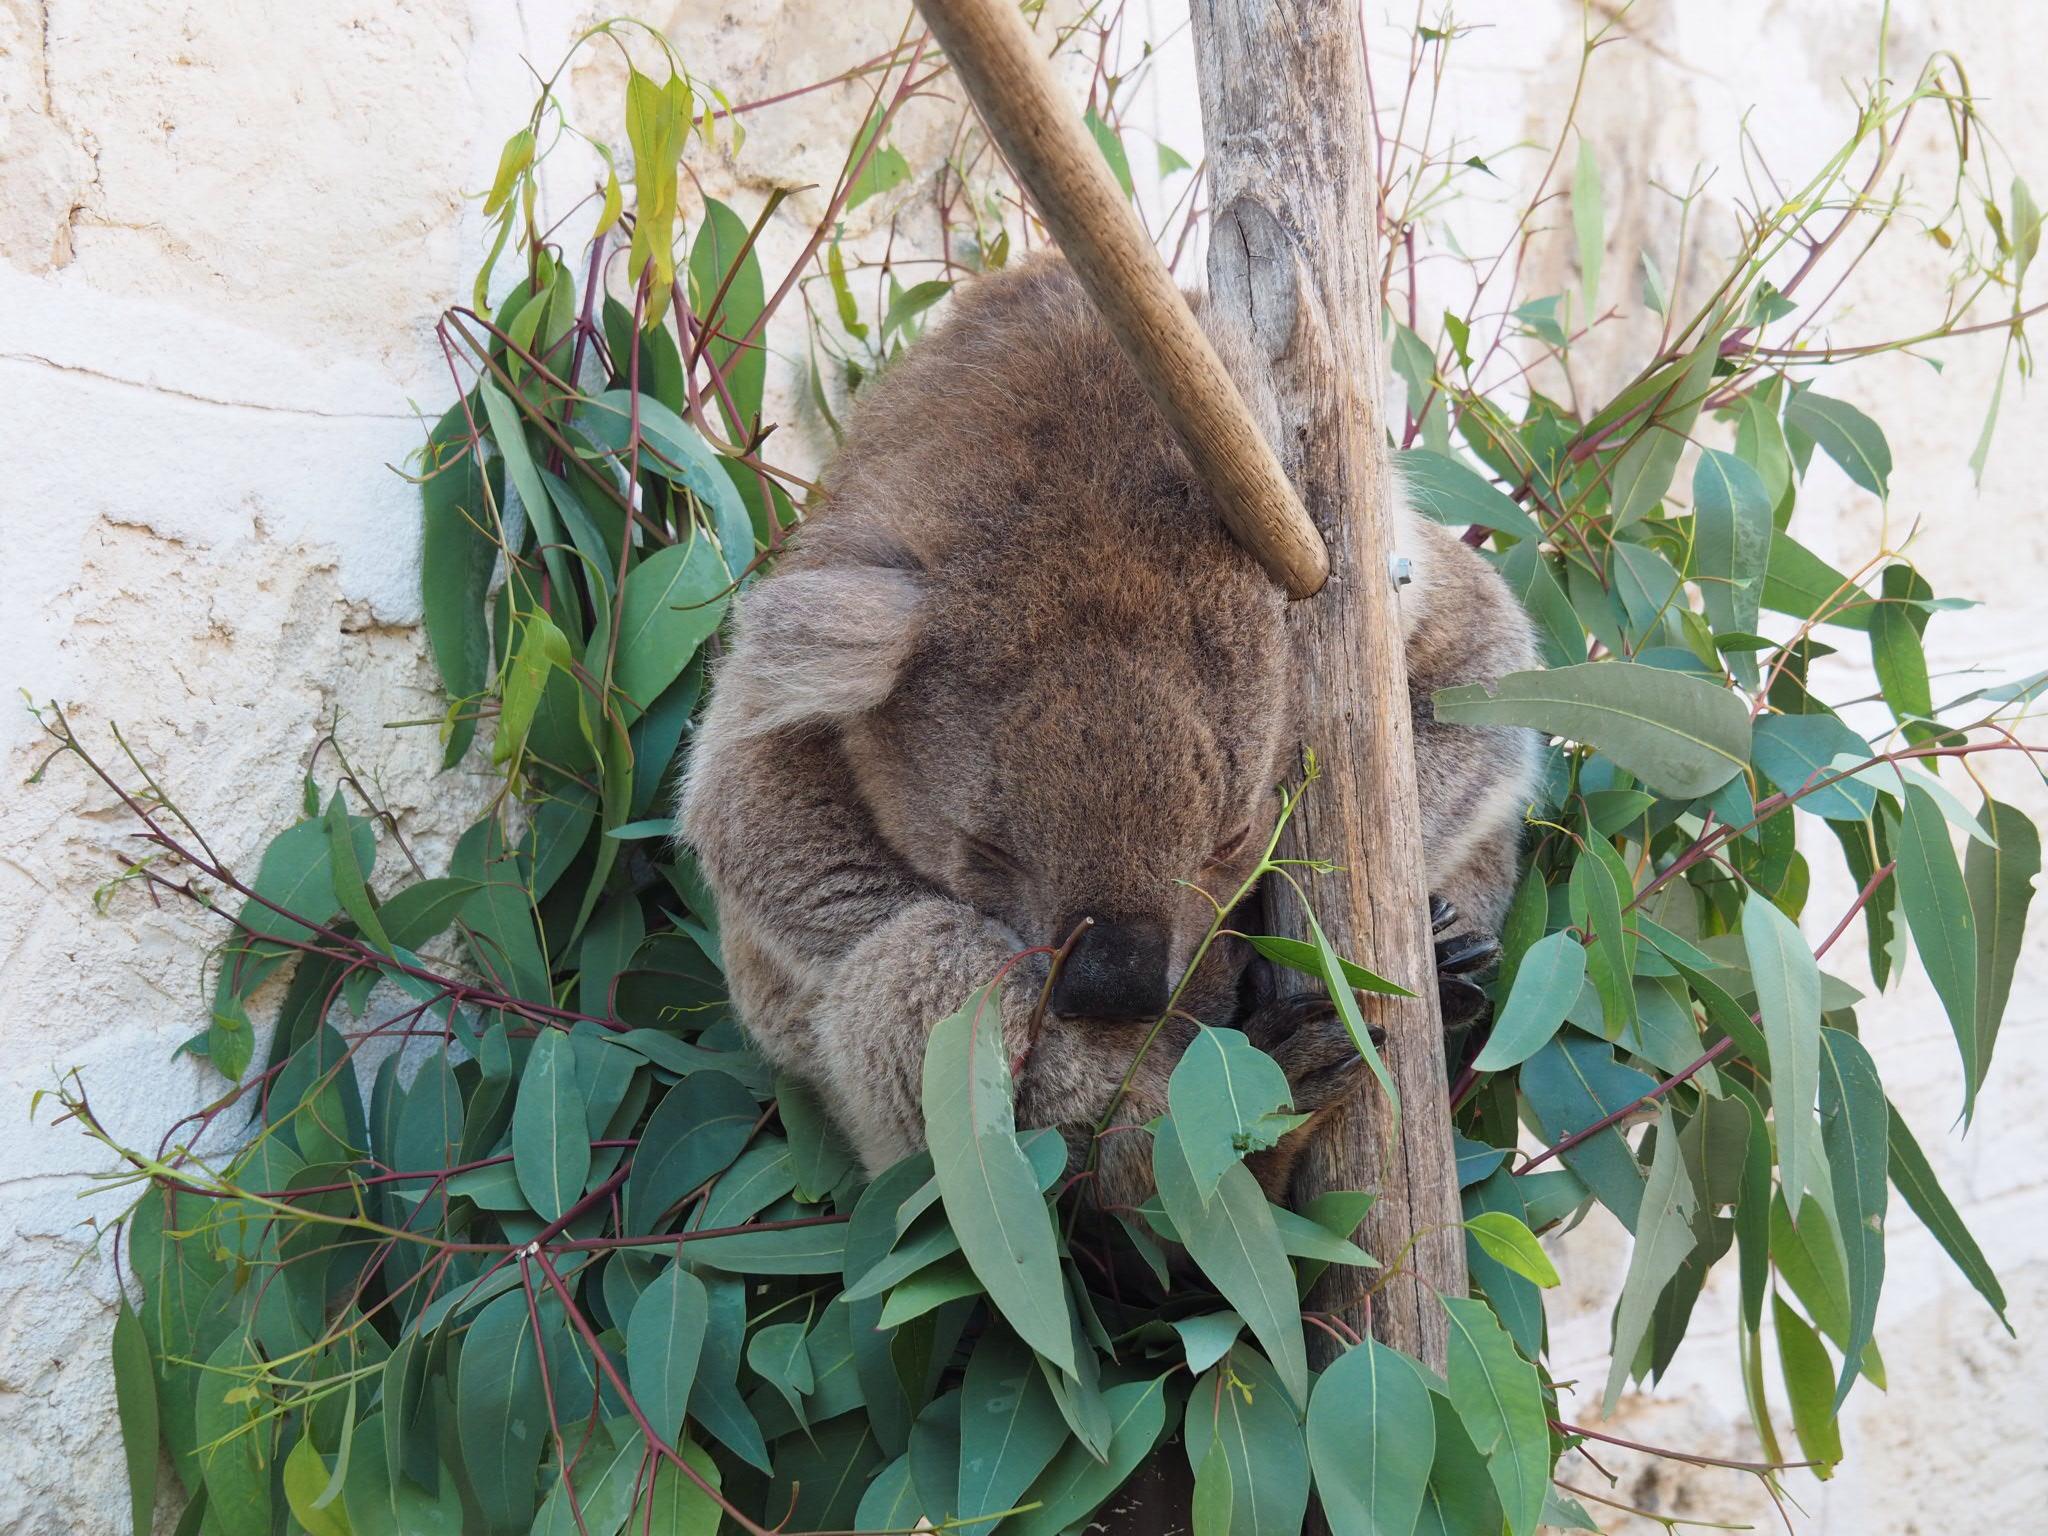 The koala was a bit sleepy despite all the excitement.